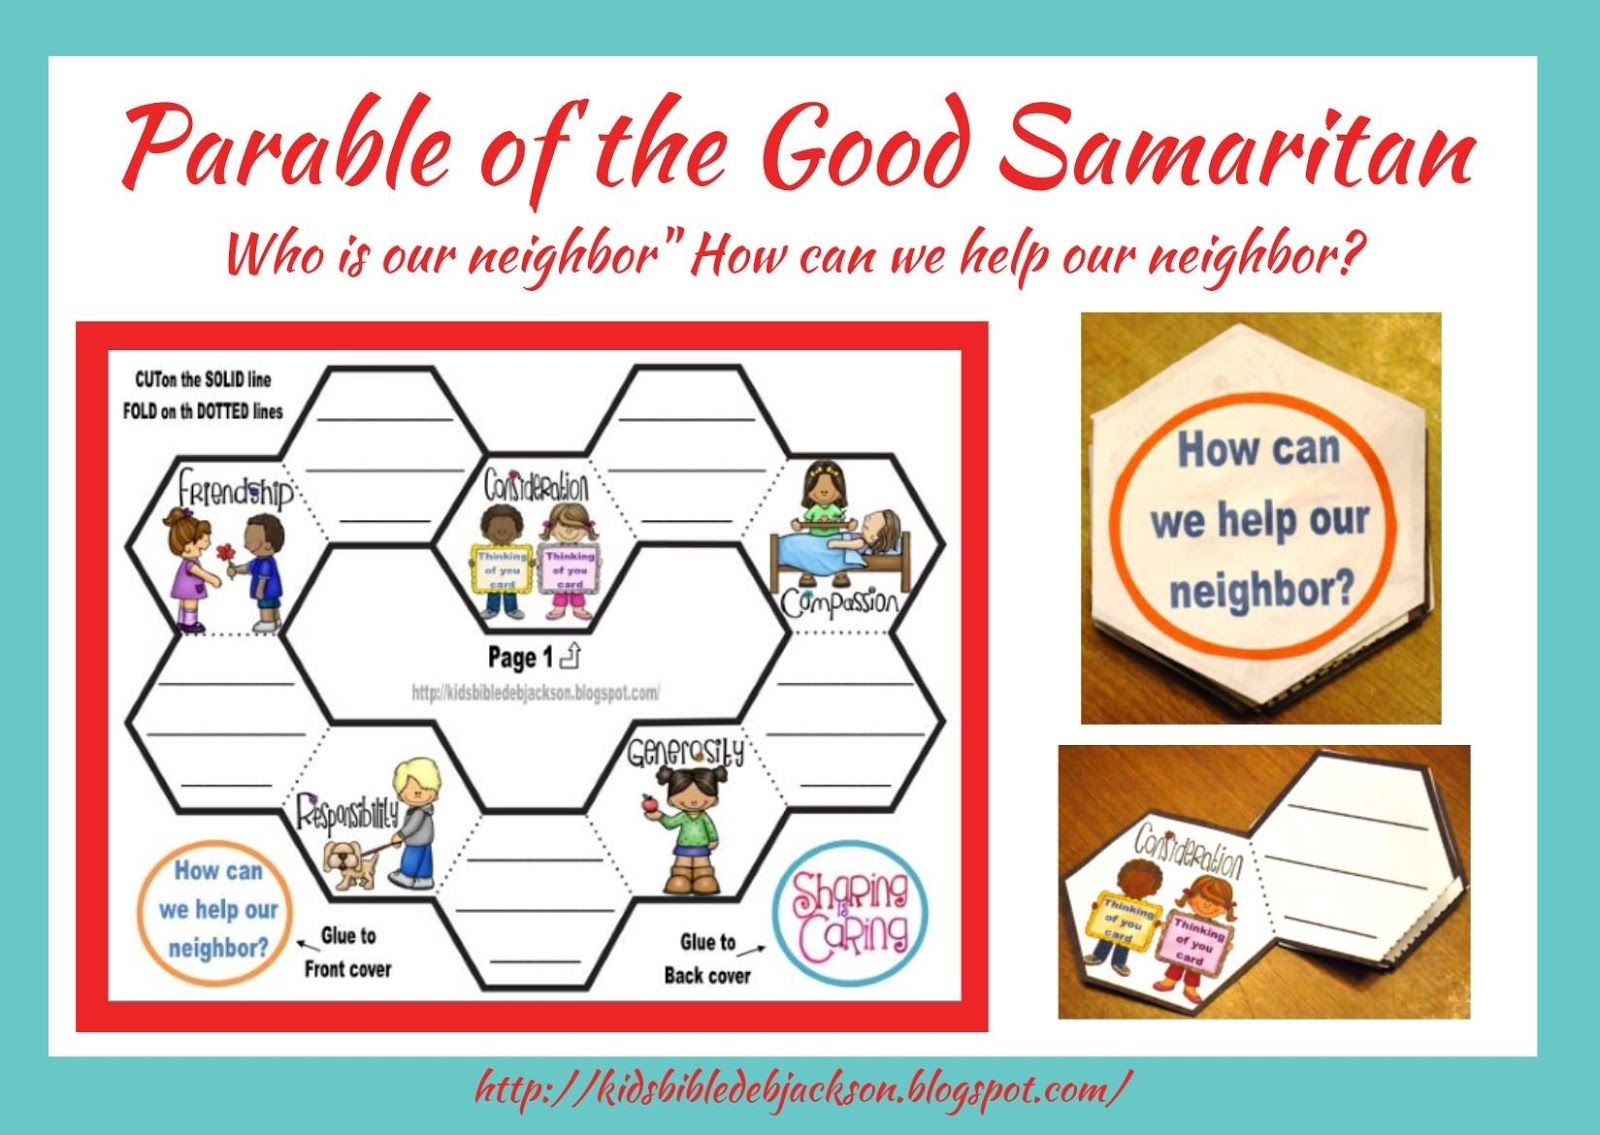 Good samaritan sunday school craft - Bible Fun For Kids Parable Of The Good Samaritan